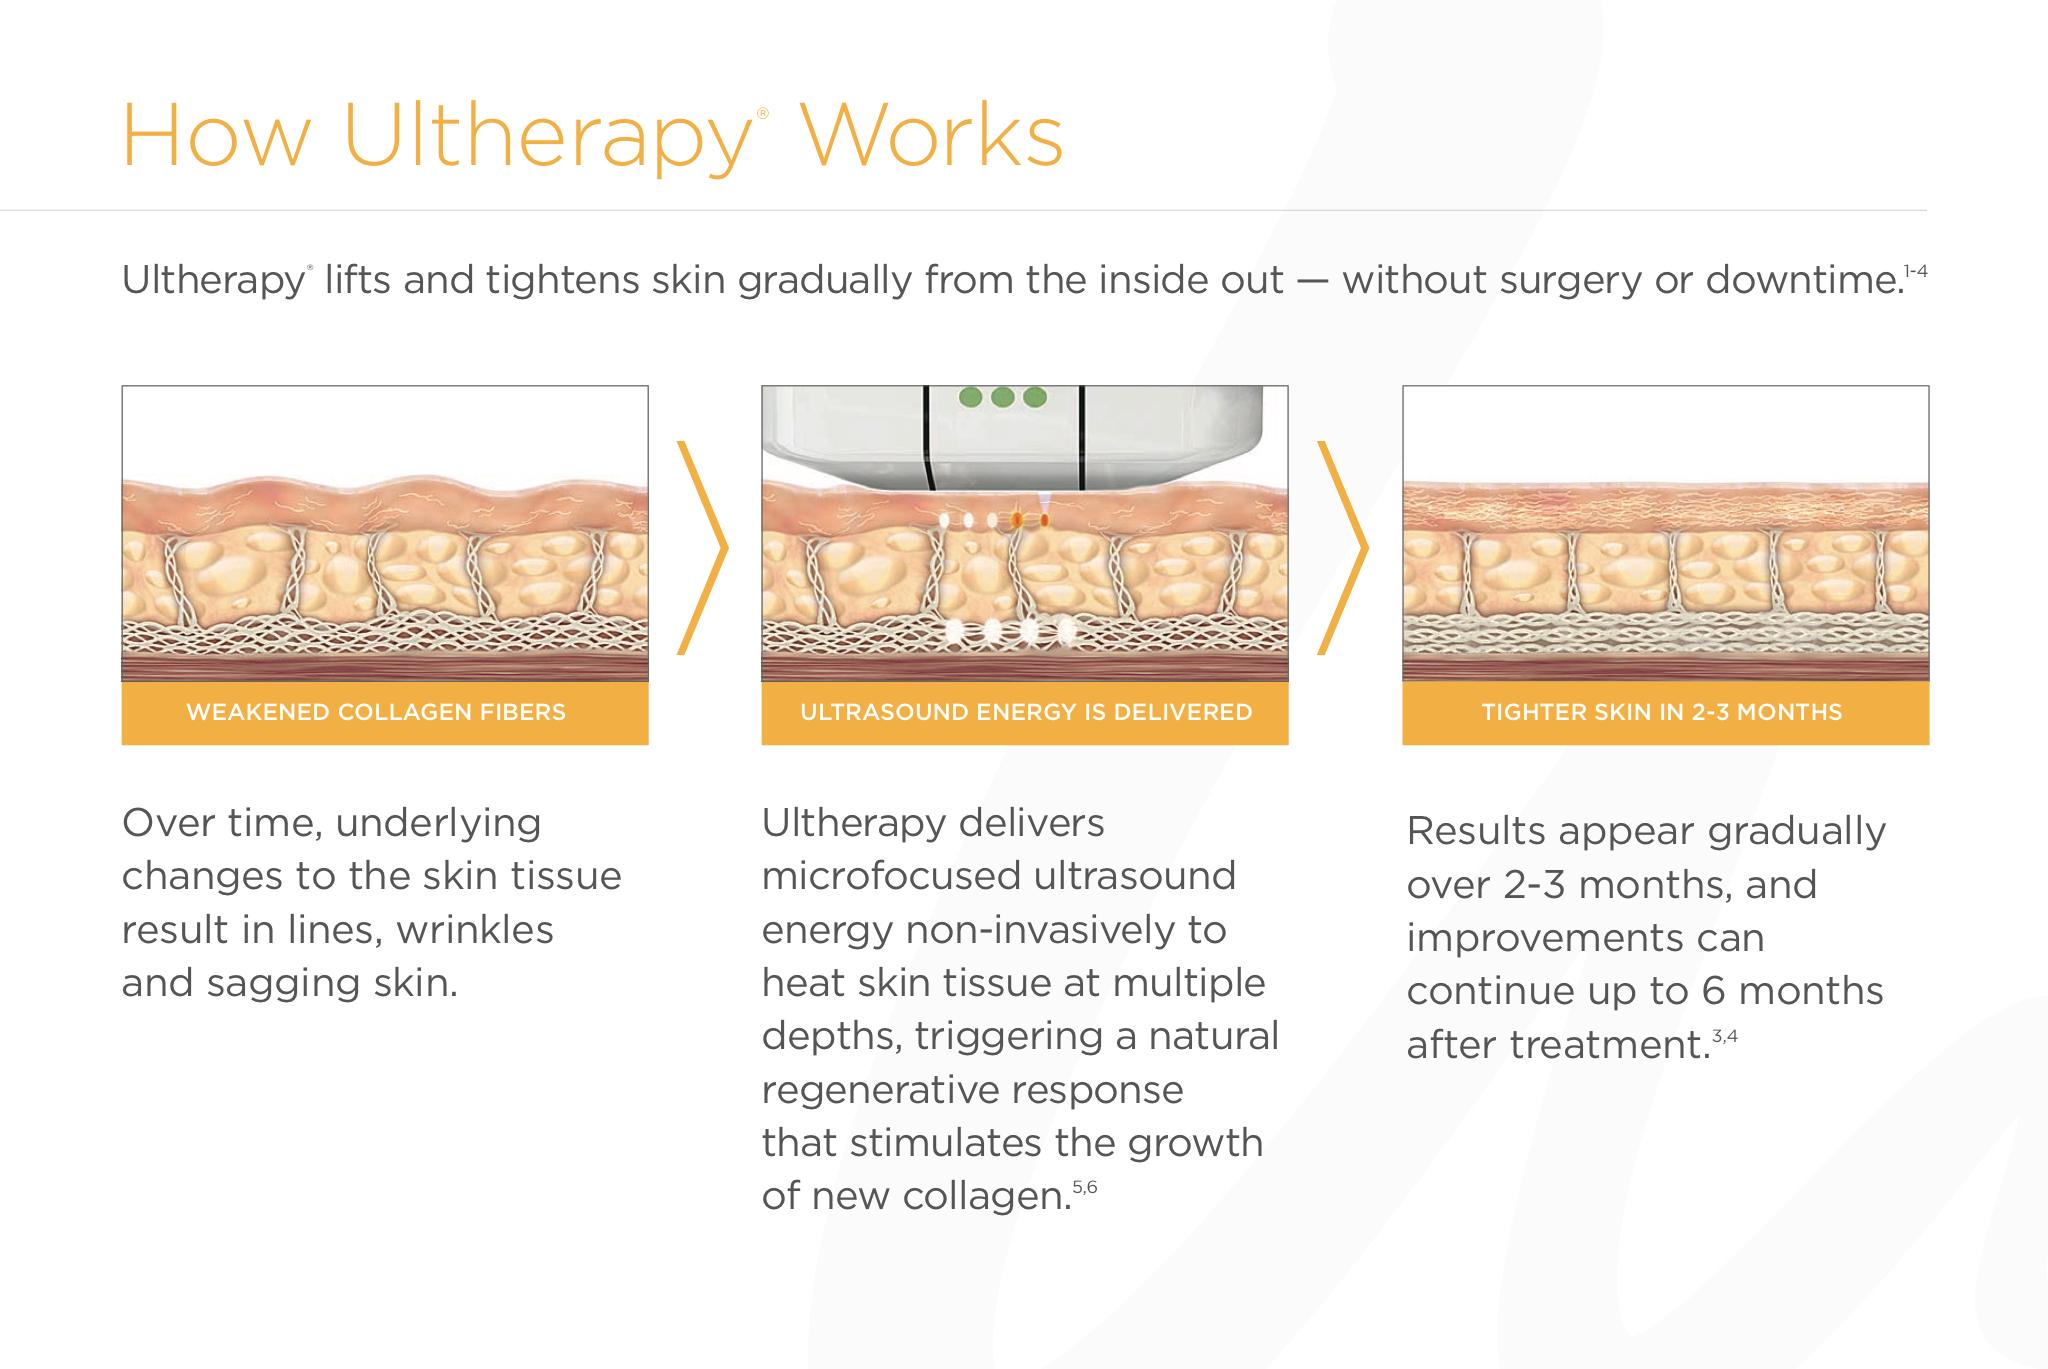 Ultherapy Non-Surgical Lift: Lake Forest Dermatology, Bannockburn (Chicago) IL — Lake Forest Dermatology